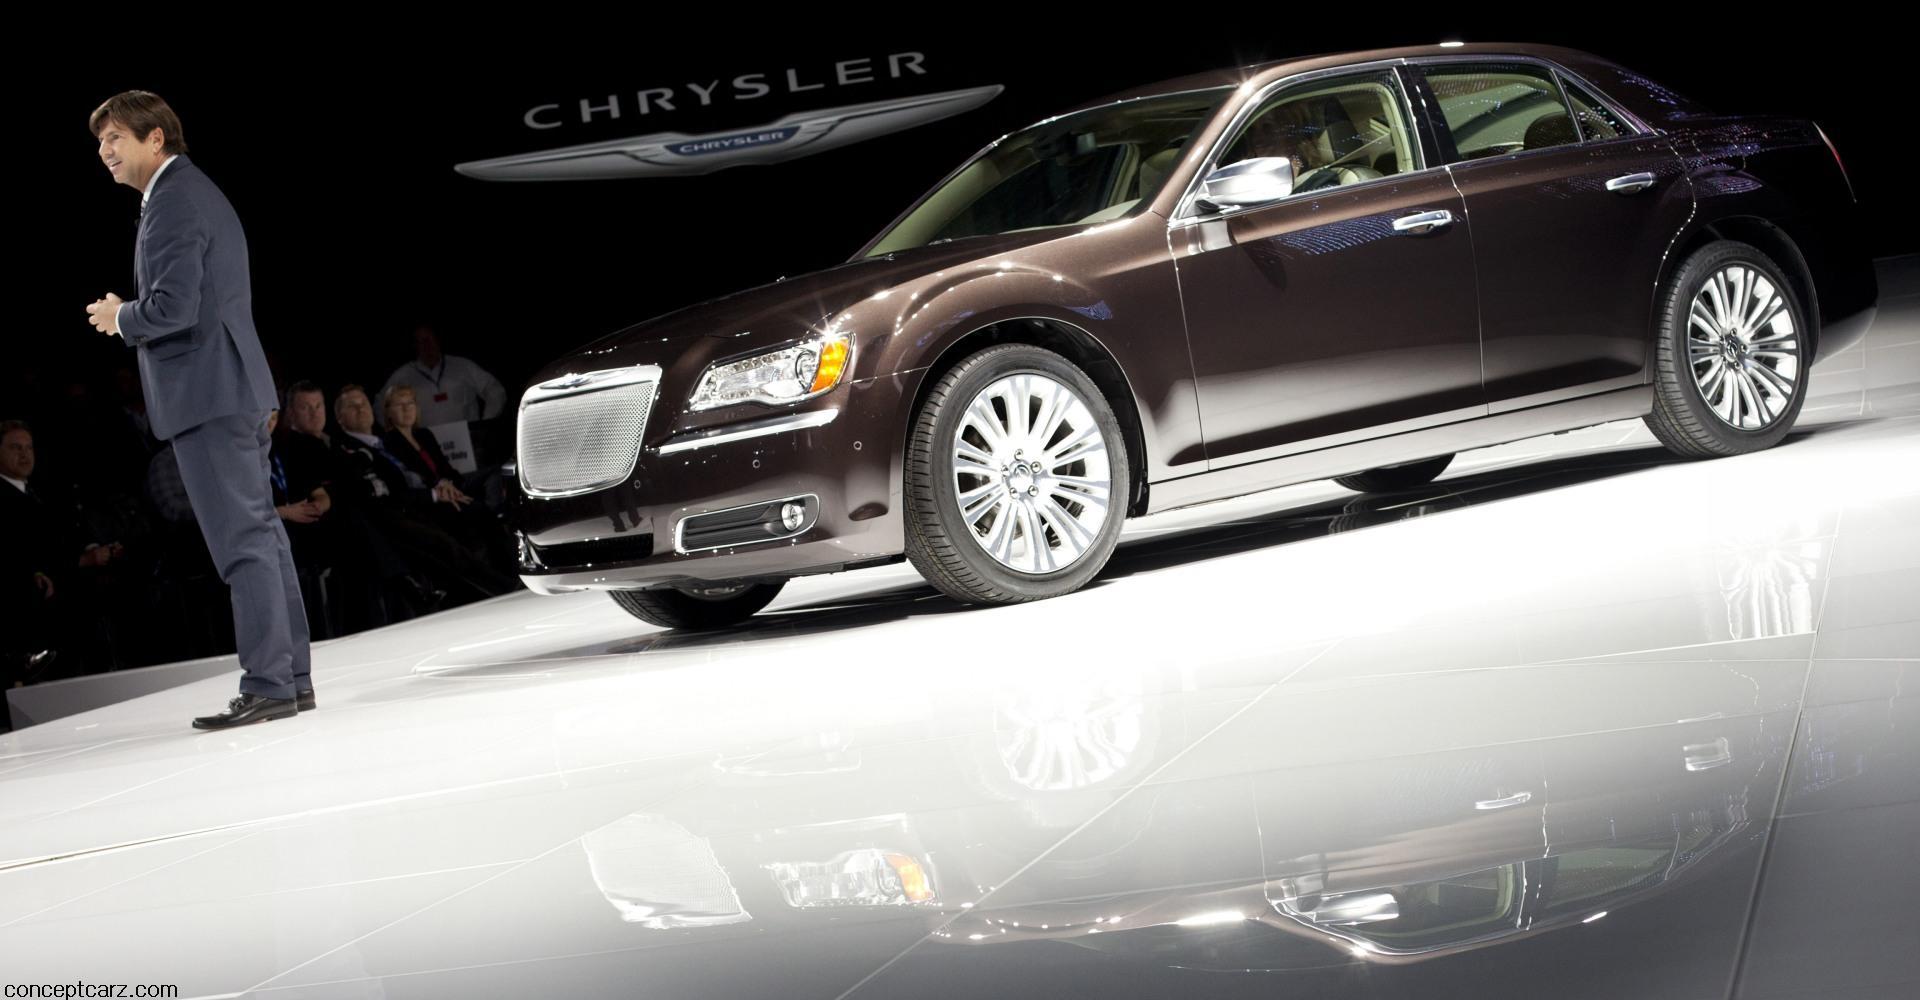 2012 chrysler 300c executive series technical. Black Bedroom Furniture Sets. Home Design Ideas